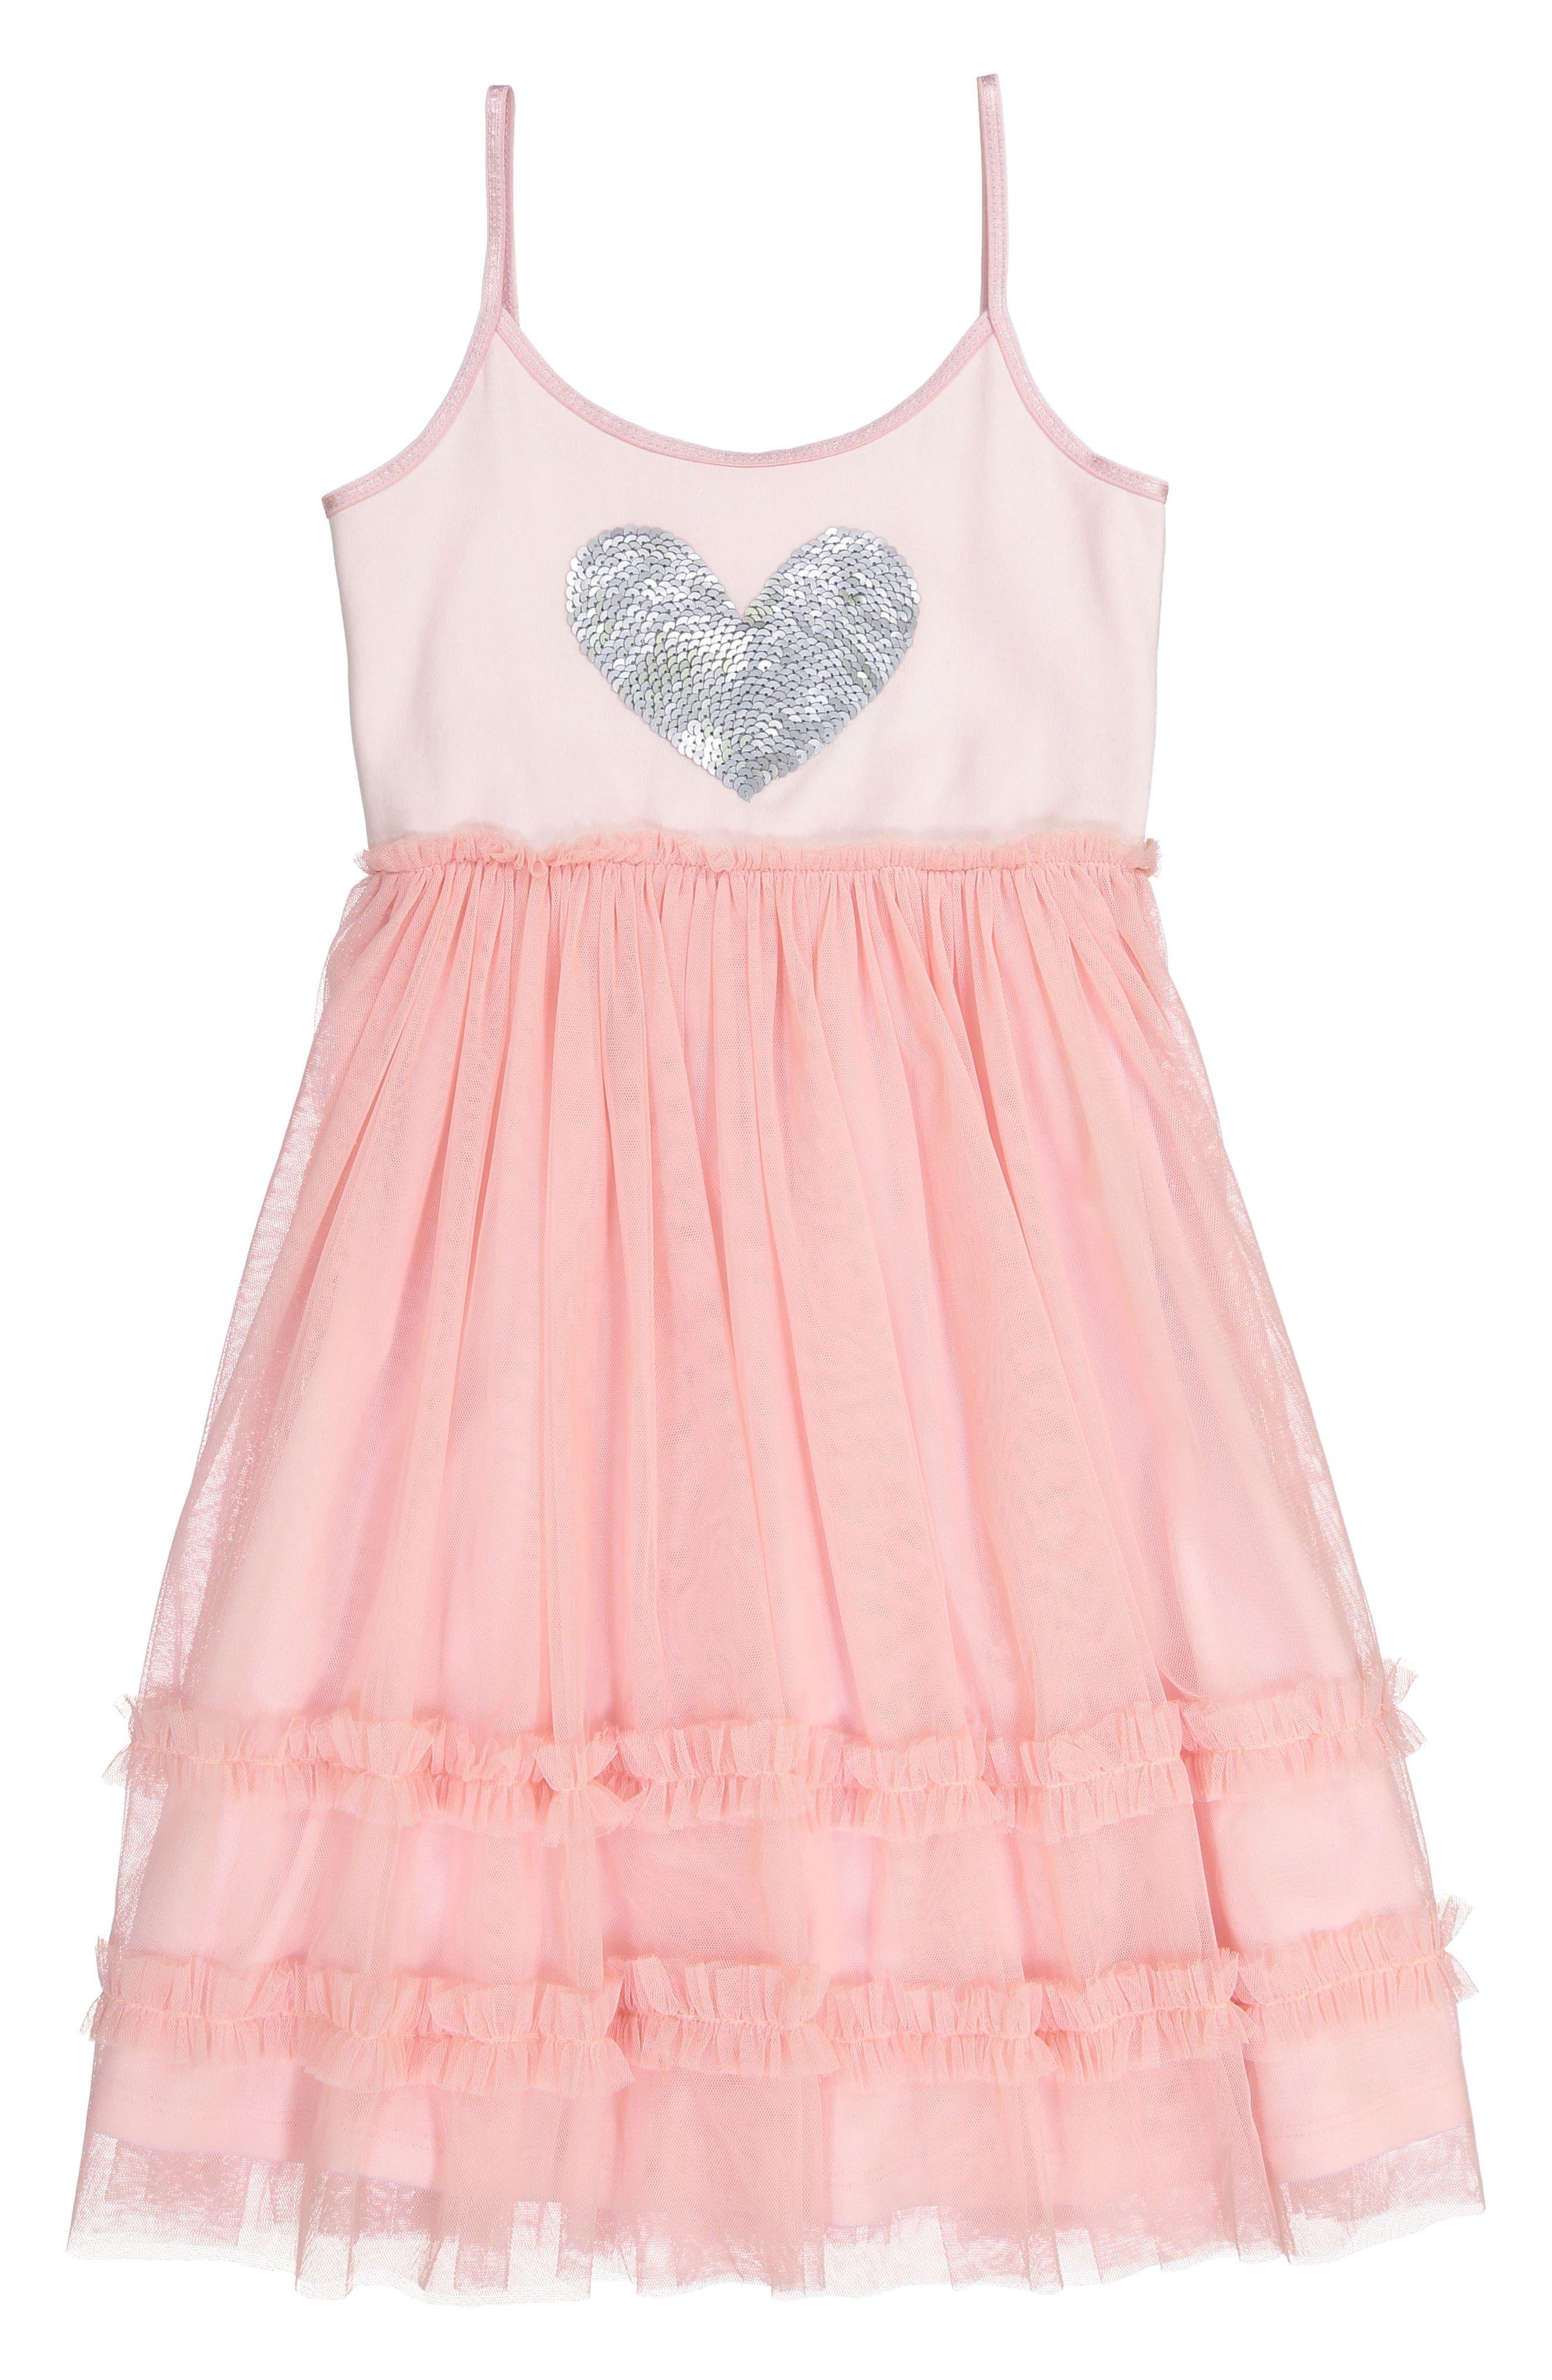 Masala Baby Sequin Heart Dress with Tulle Skirt (Toddler Girls, Little Girls & Big Girls)